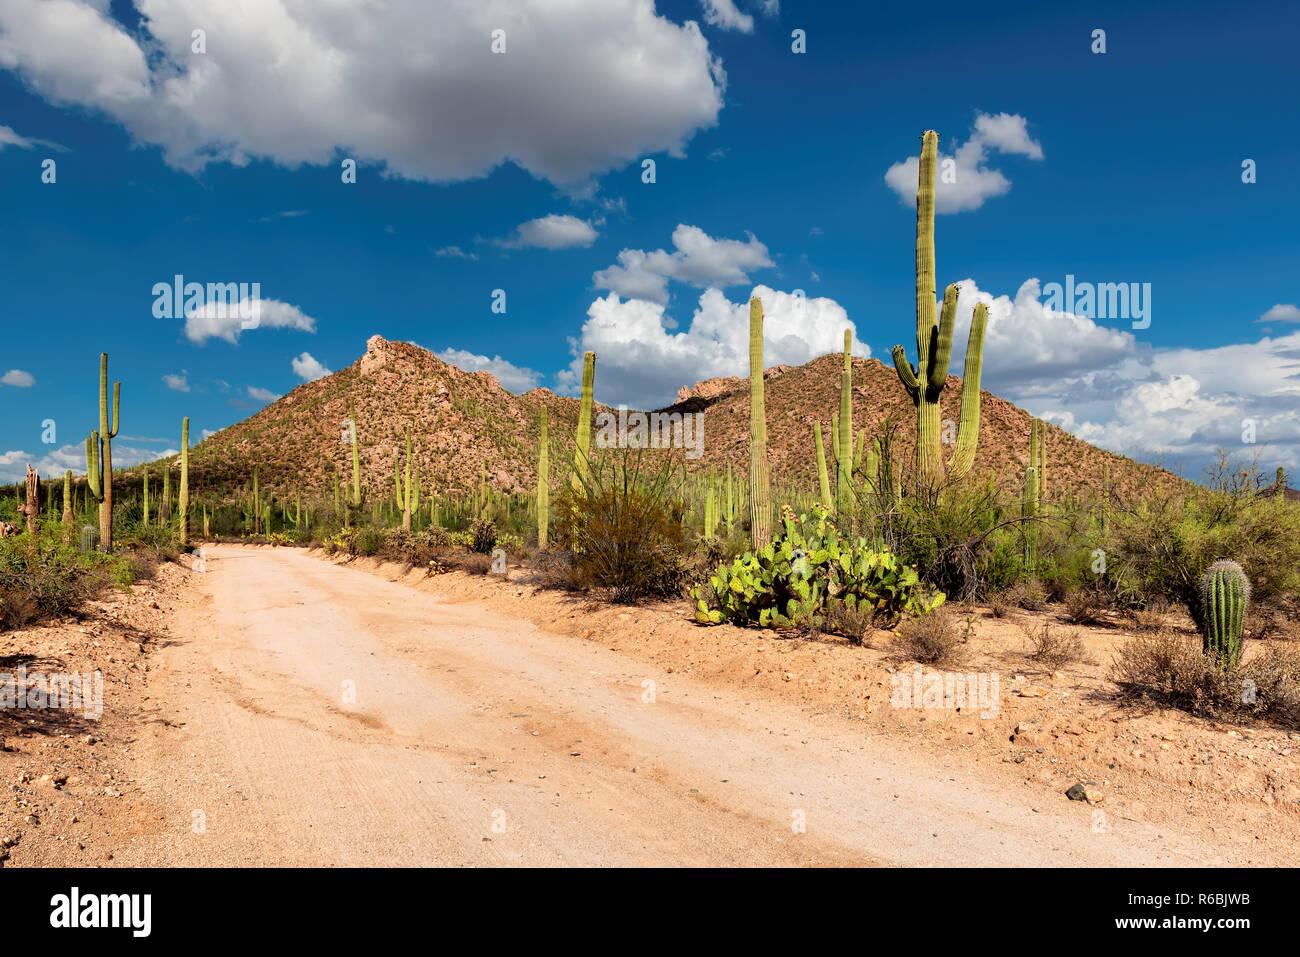 Arizona desert road with Saguaro cacti Stock Photo